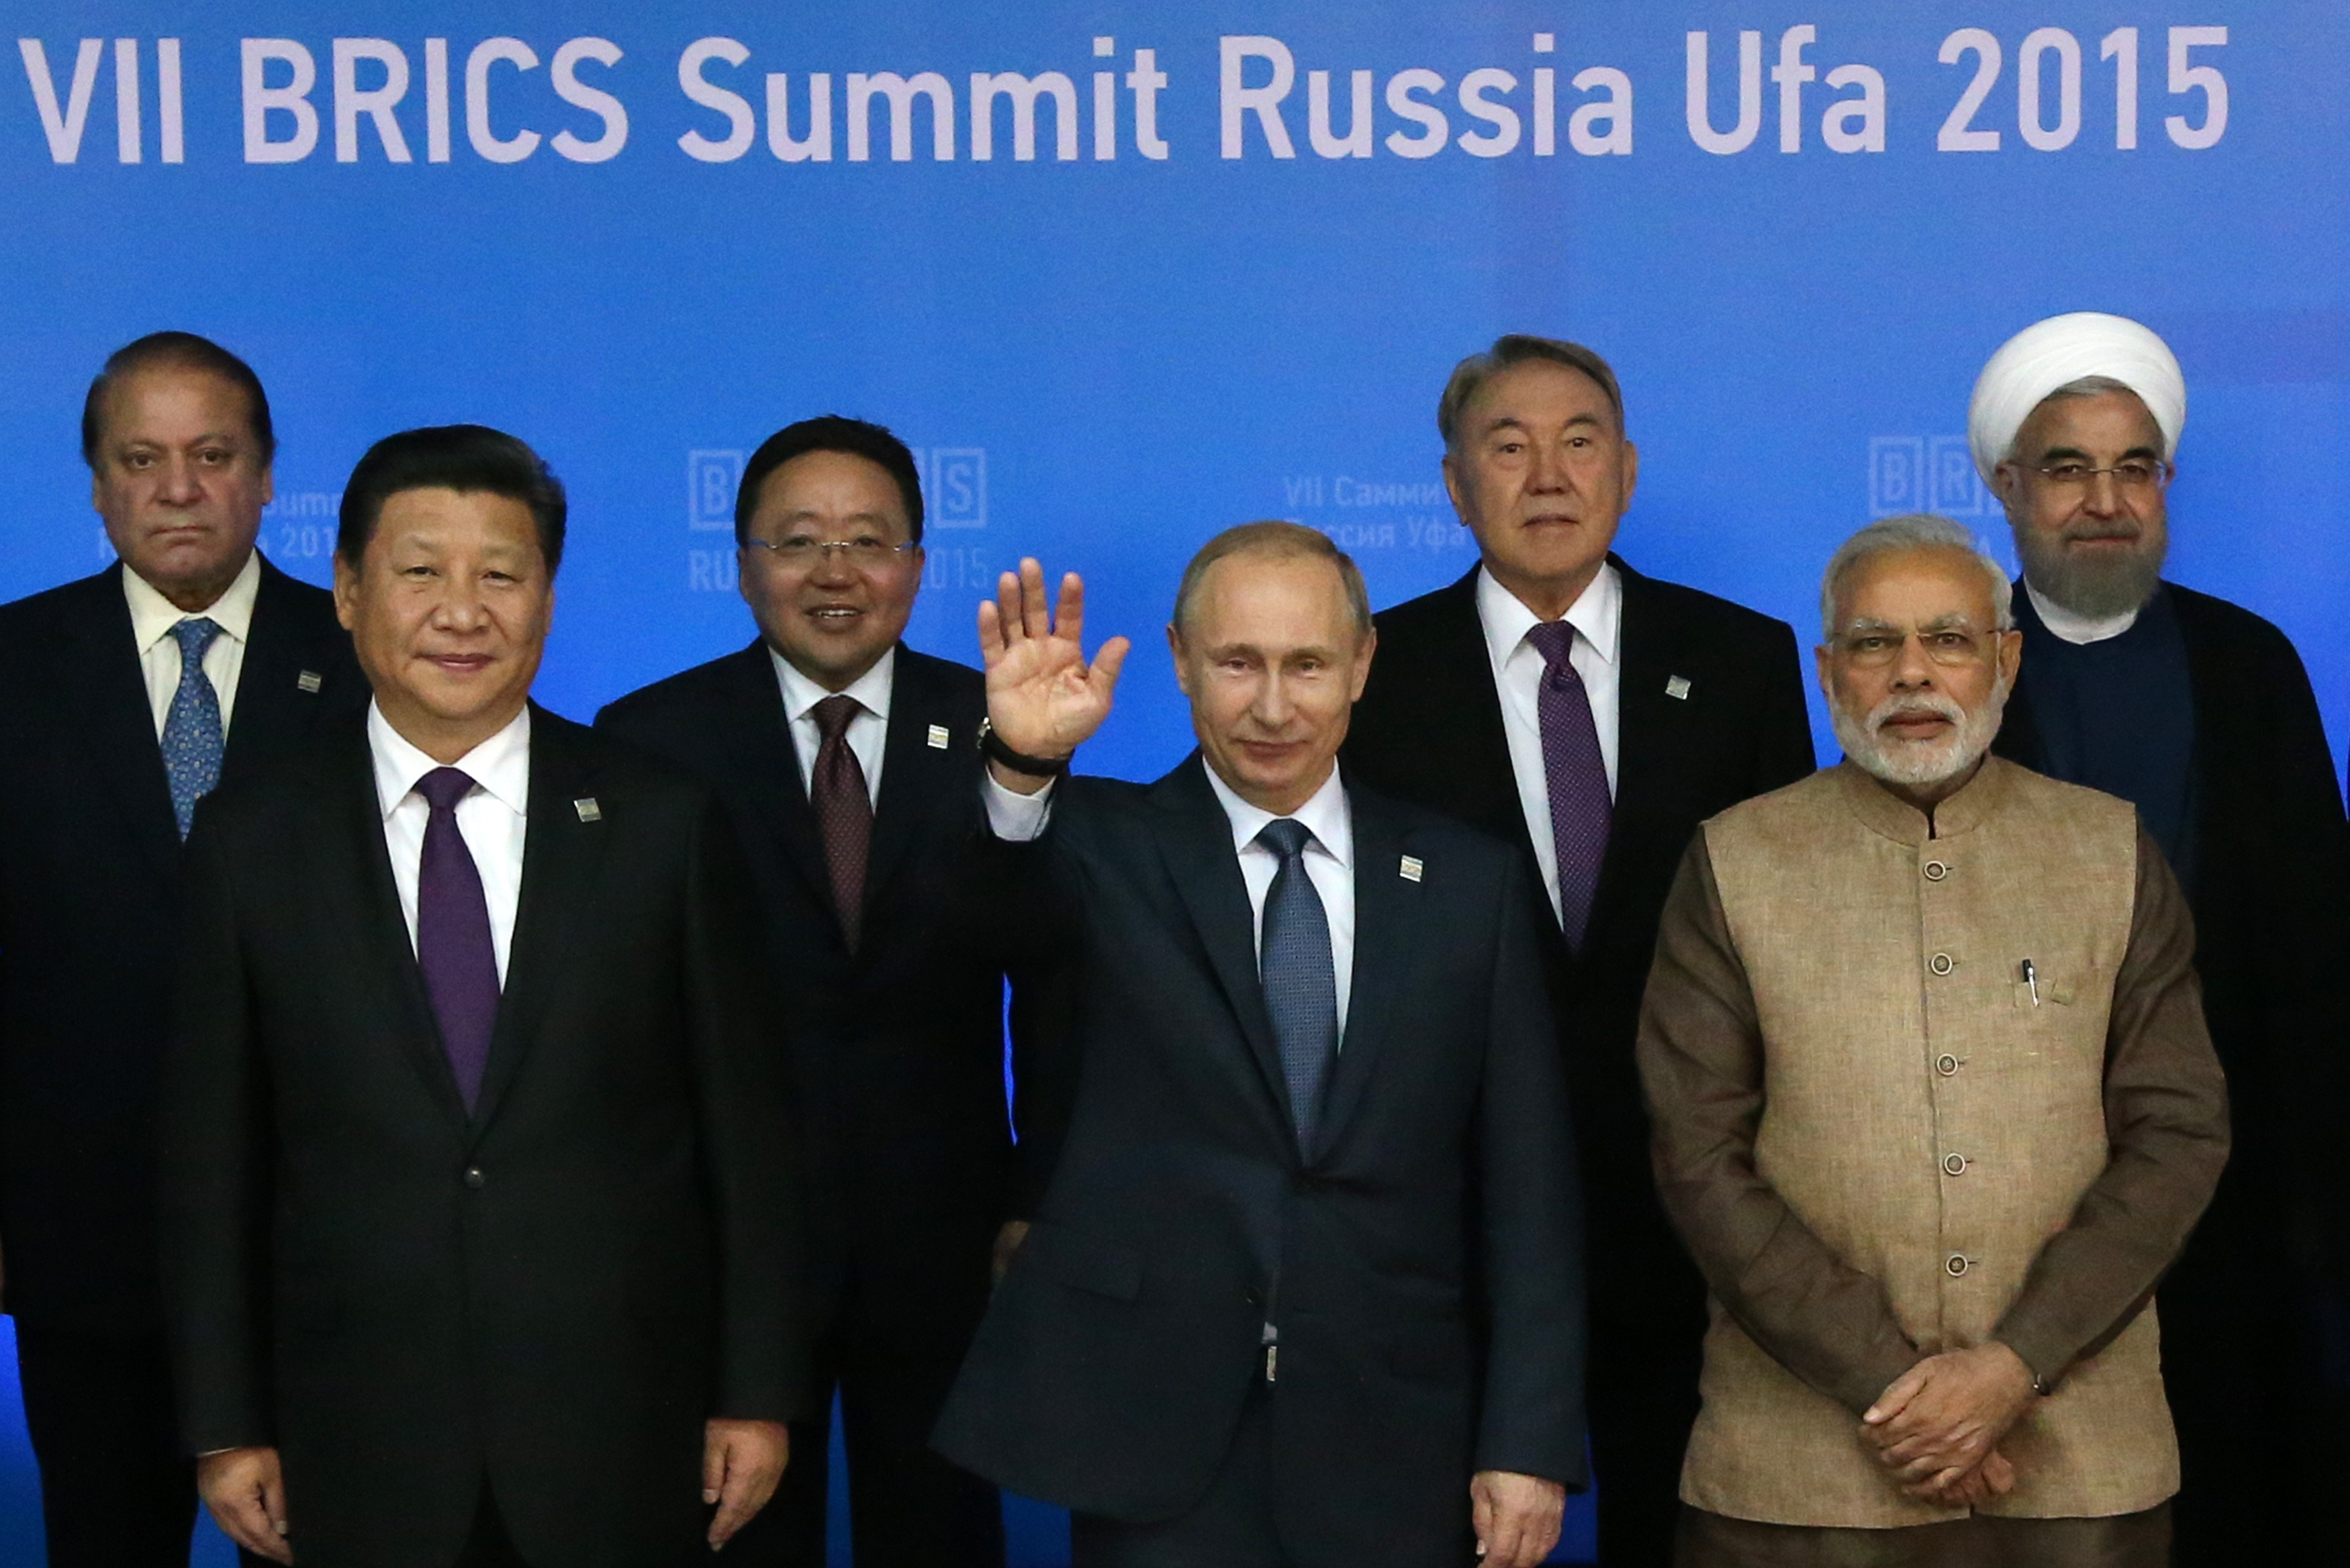 From left: Pakistani Prime Minister Muhammad Nawaz Sharif, Chinese President Xi Jinping, Mongolian President Elbegdorj Tsakhia, Russian President Vladimir Putin, Kazakh President Nursultan Nazarbayev, Indian Prime Minister Narendra Modi, Iranian President Hassan Rouhani pose for a photo during the BRICS 2015 Summit in Ufa, Russia, on July 9, 2015